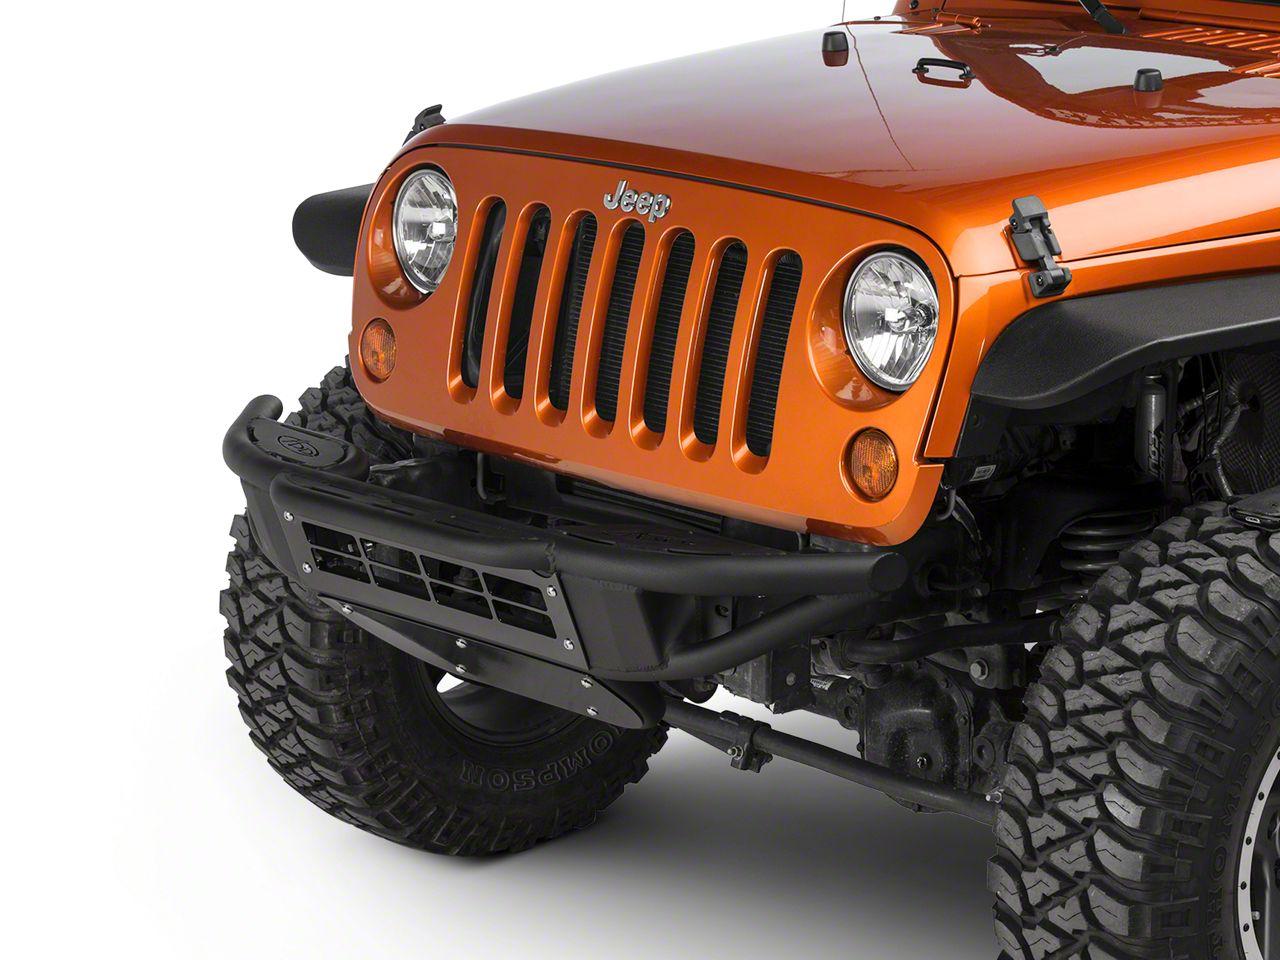 Addictive Desert Designs Venom Front Bumper (07-18 Jeep Wrangler JK)